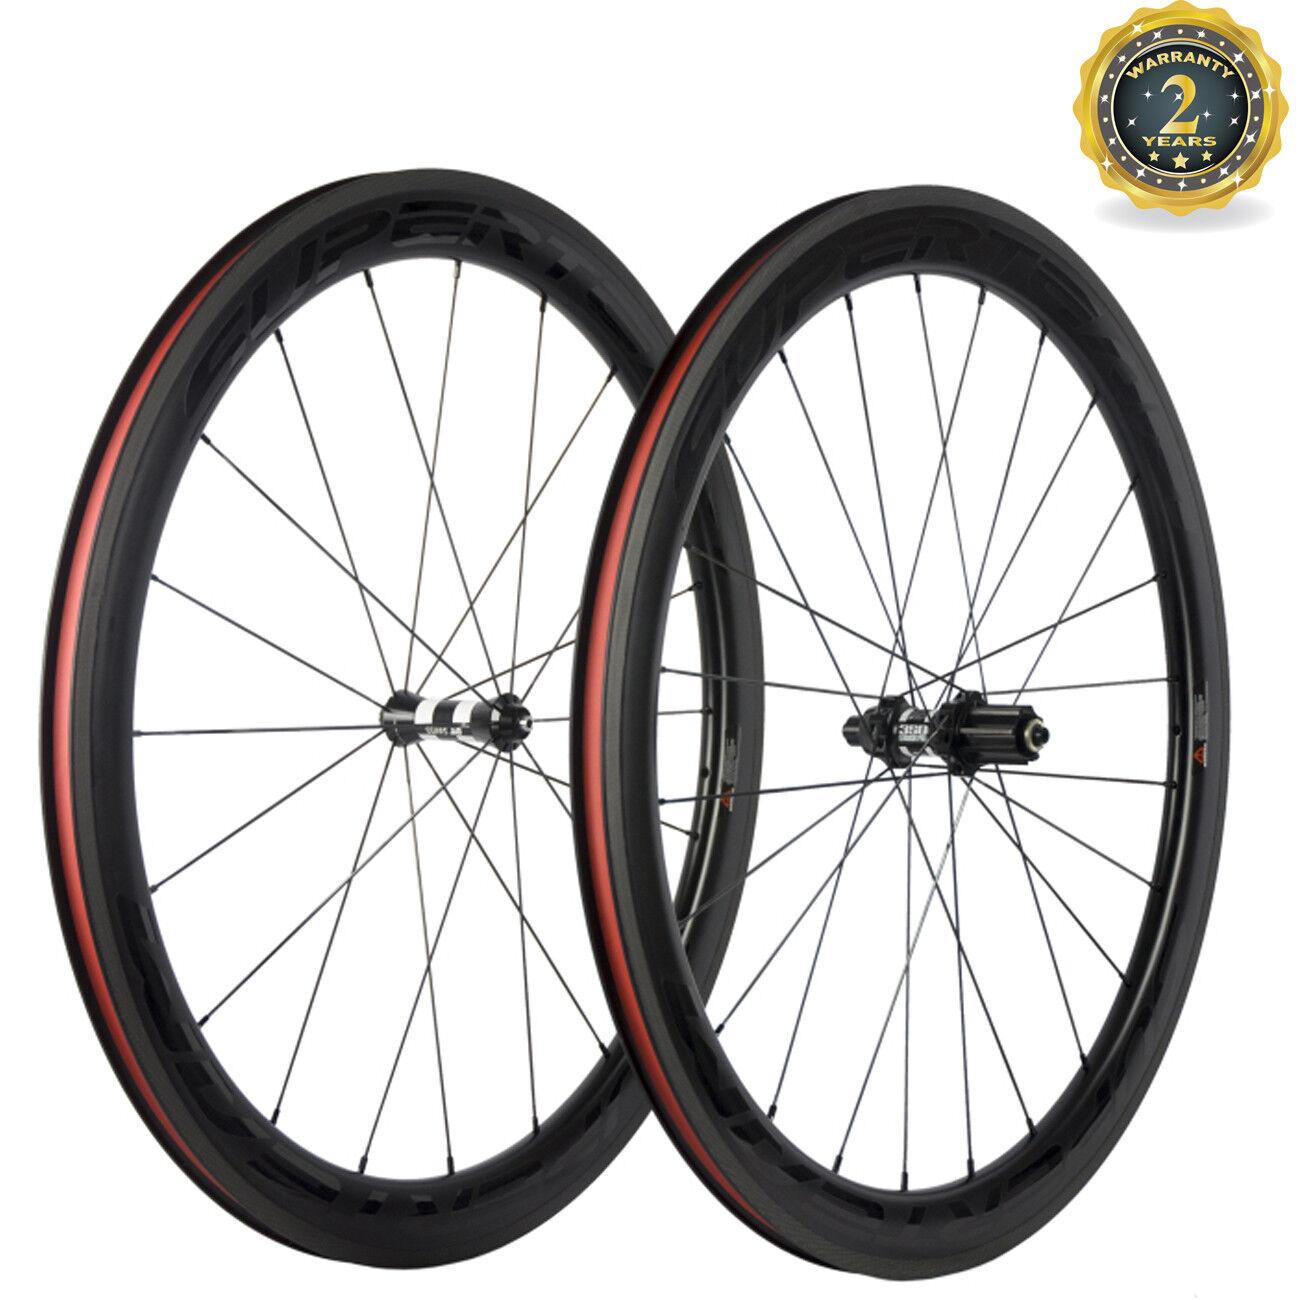 50mm Deep Carbon Wheels DT 350S Hub 25mm Width Superteam Road Wheel Sapim Spoke